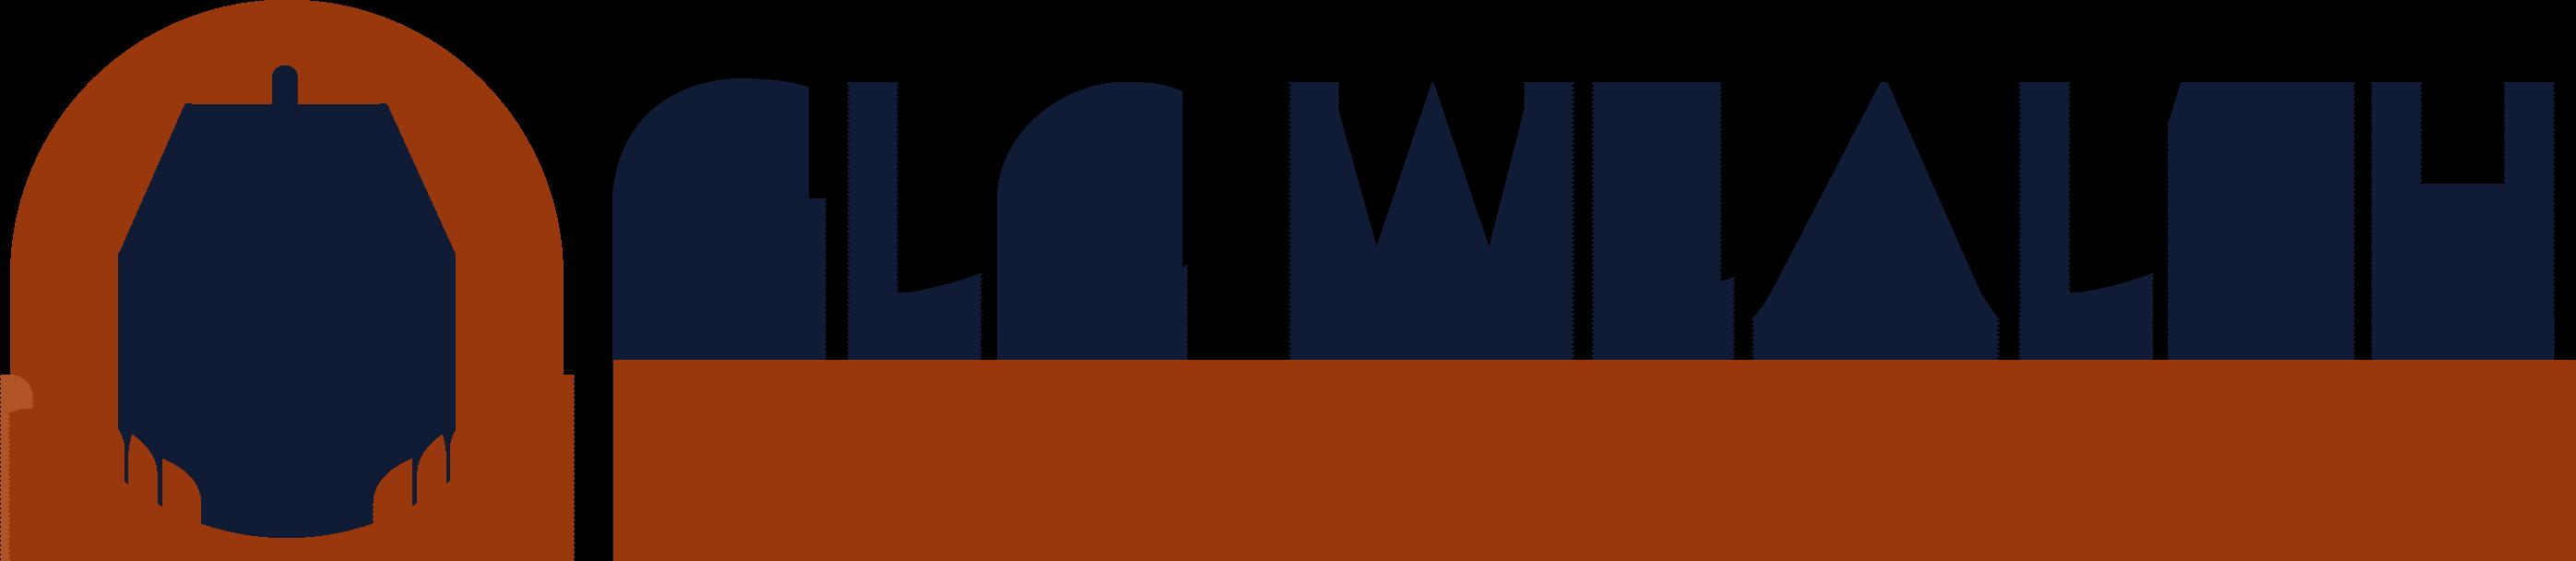 GLC Wealth Recovery Advisor